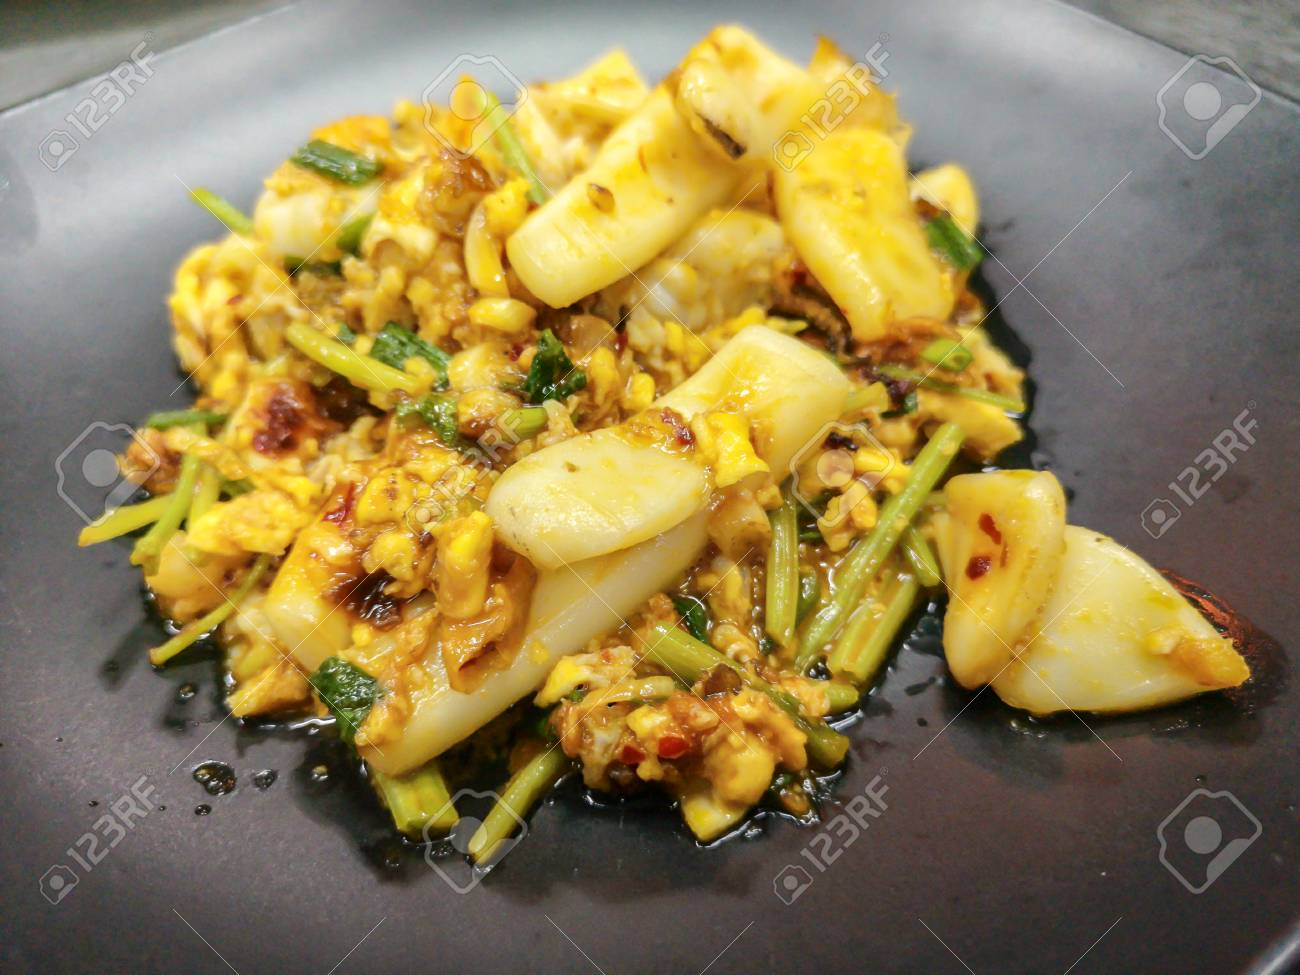 Thai cuisine stir squid in salted egg yolk sauce on black dish - 105929054